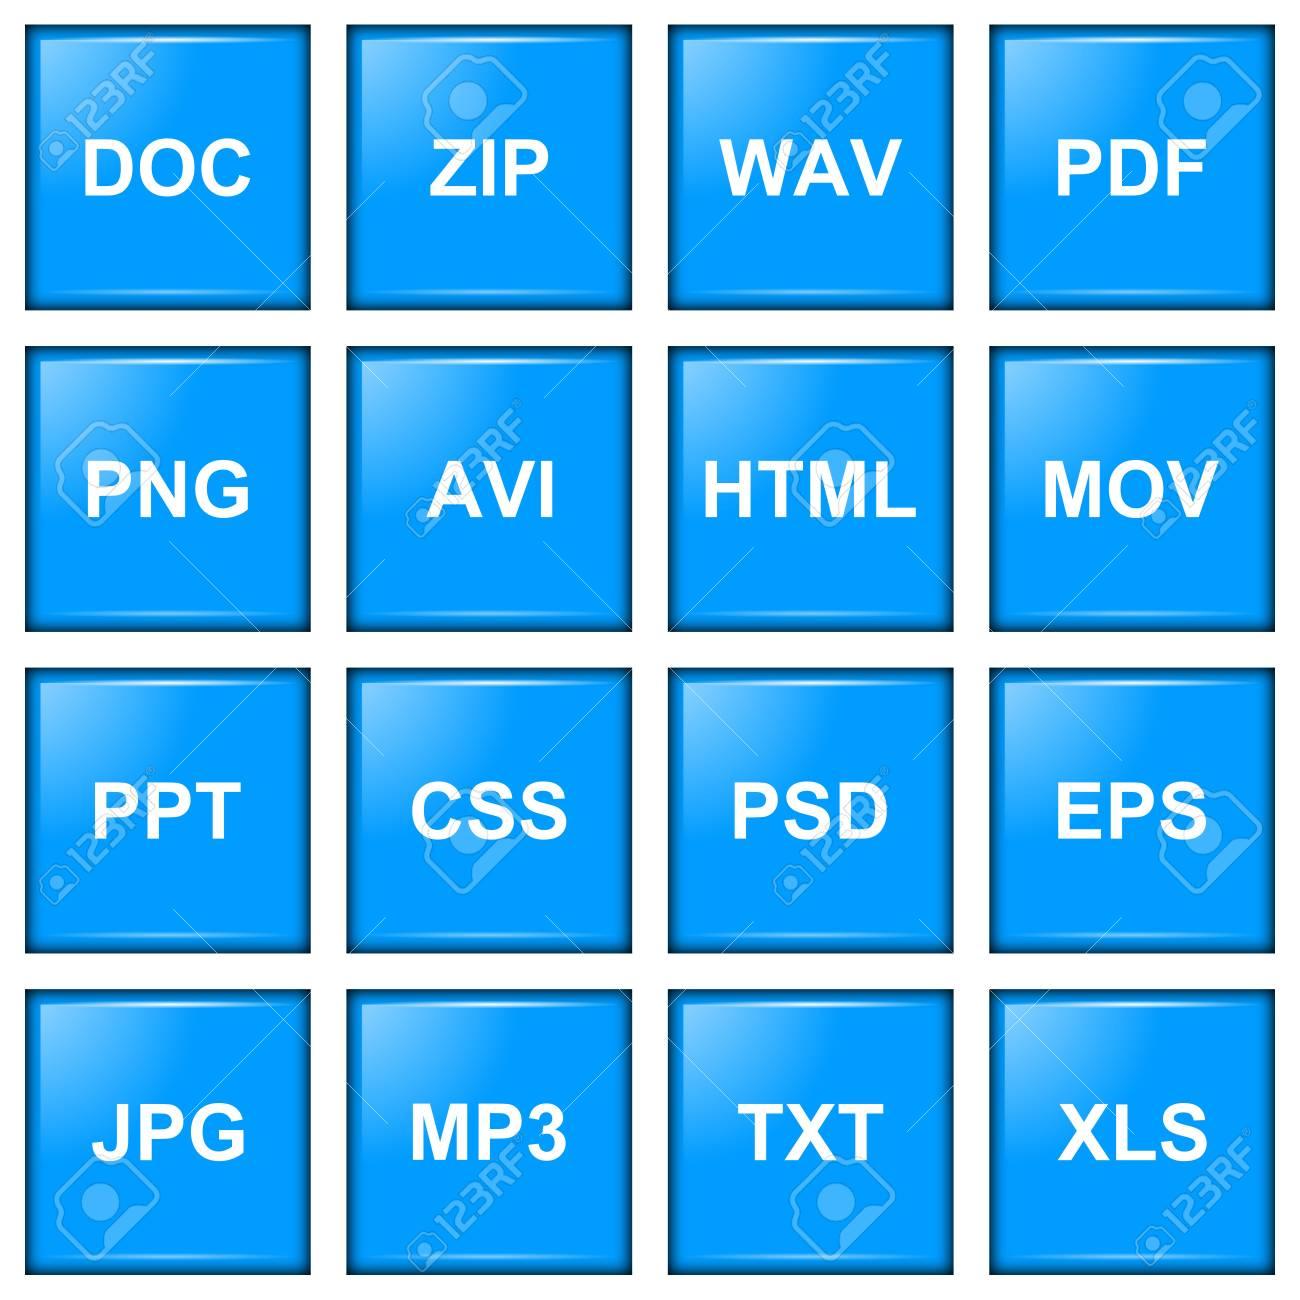 File extension blue icon series illustration Stock Illustration - 17909667